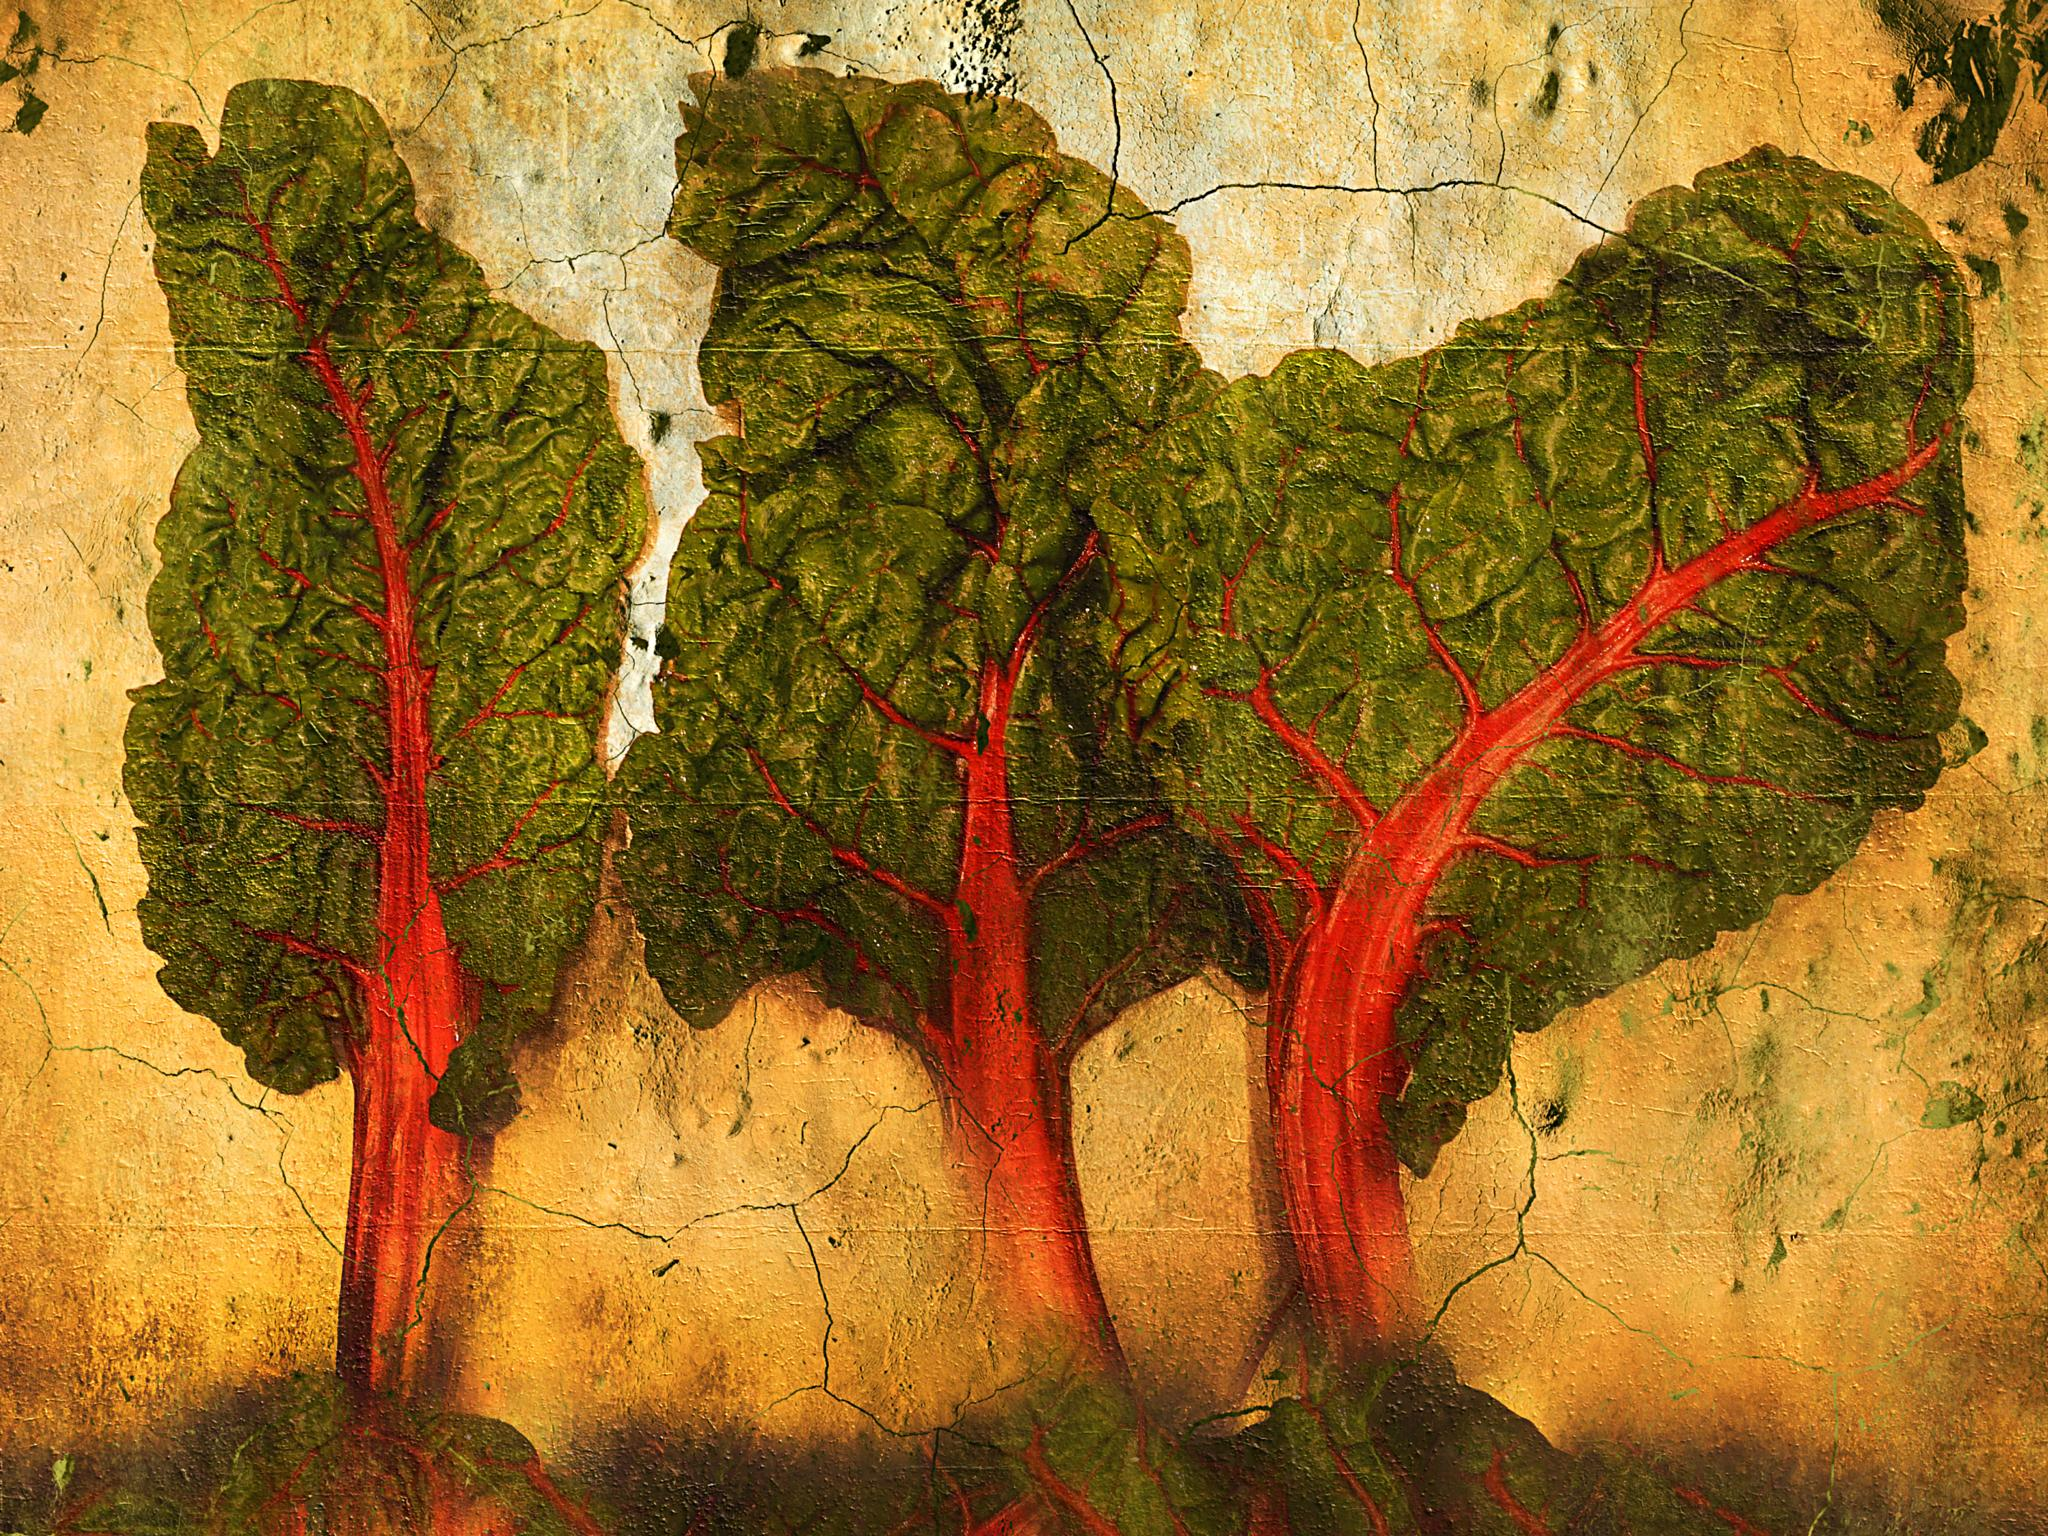 Swiss Chard Trees by mark.khan.7161